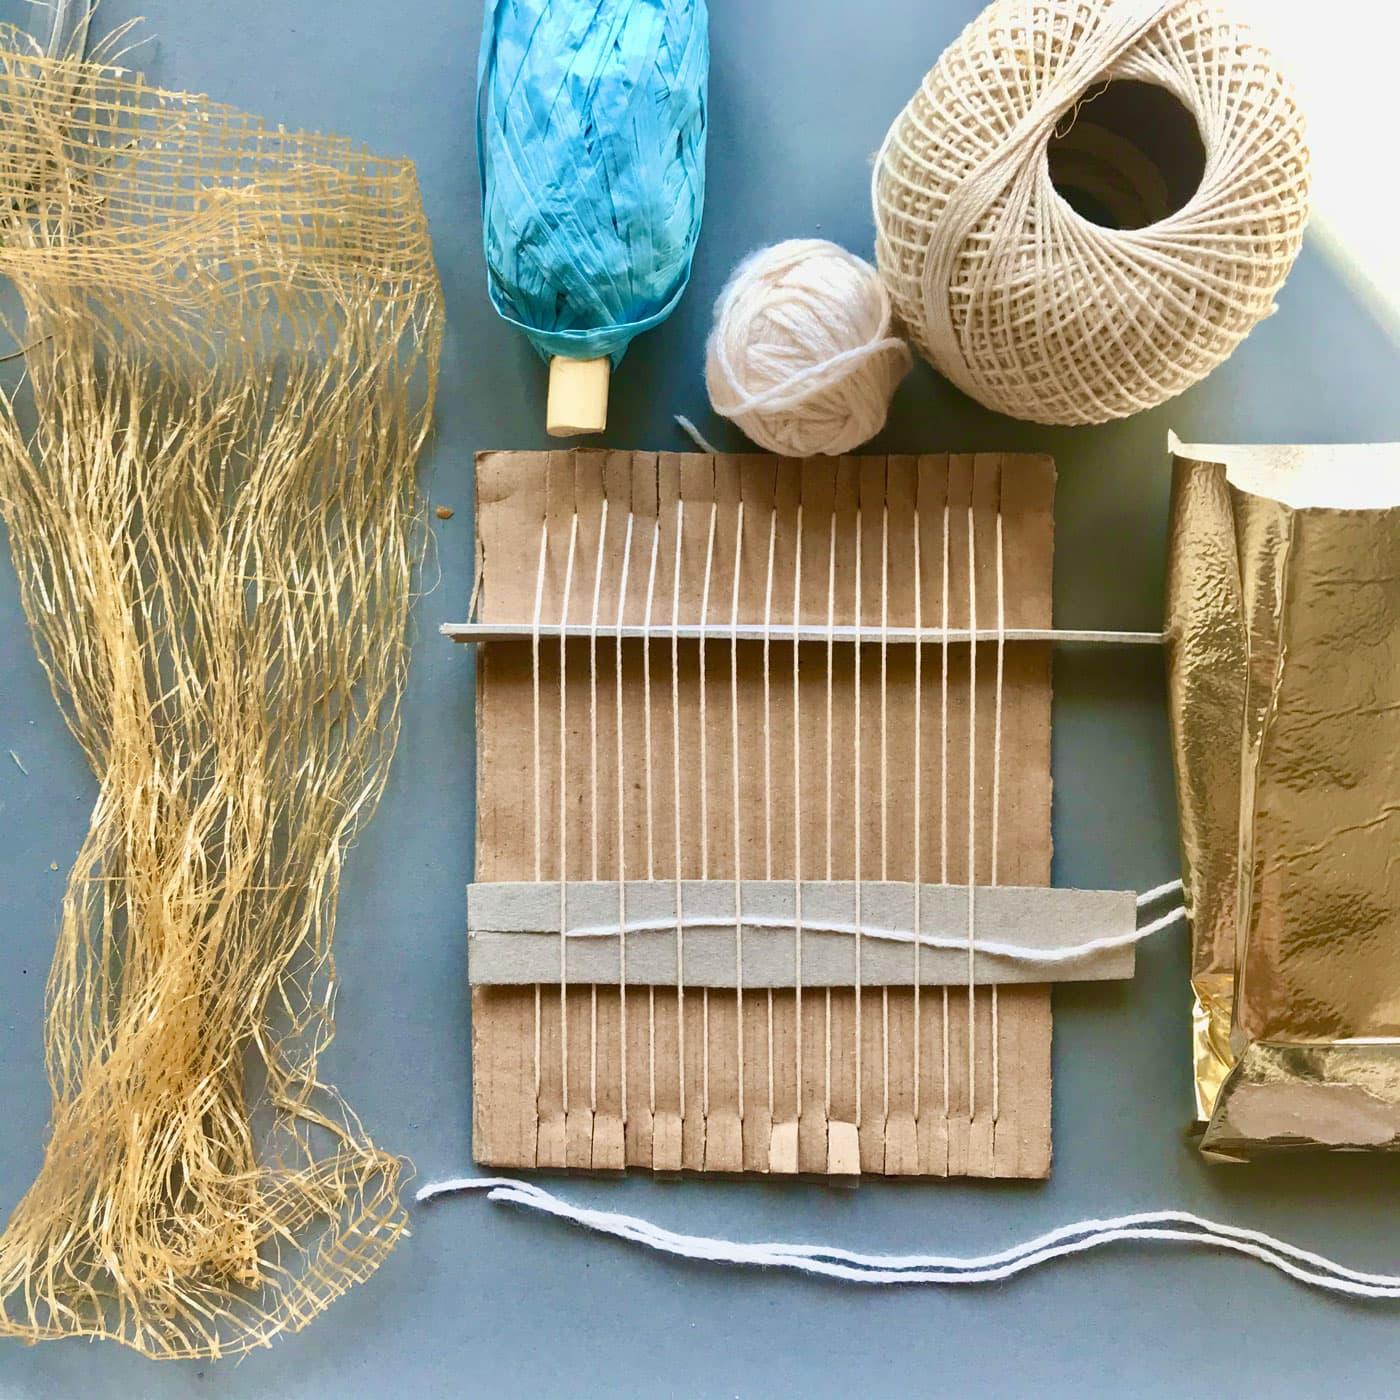 JiMonLine – Kreative Projekte für Kinder: Wandschmuck selber machen // HIMBER